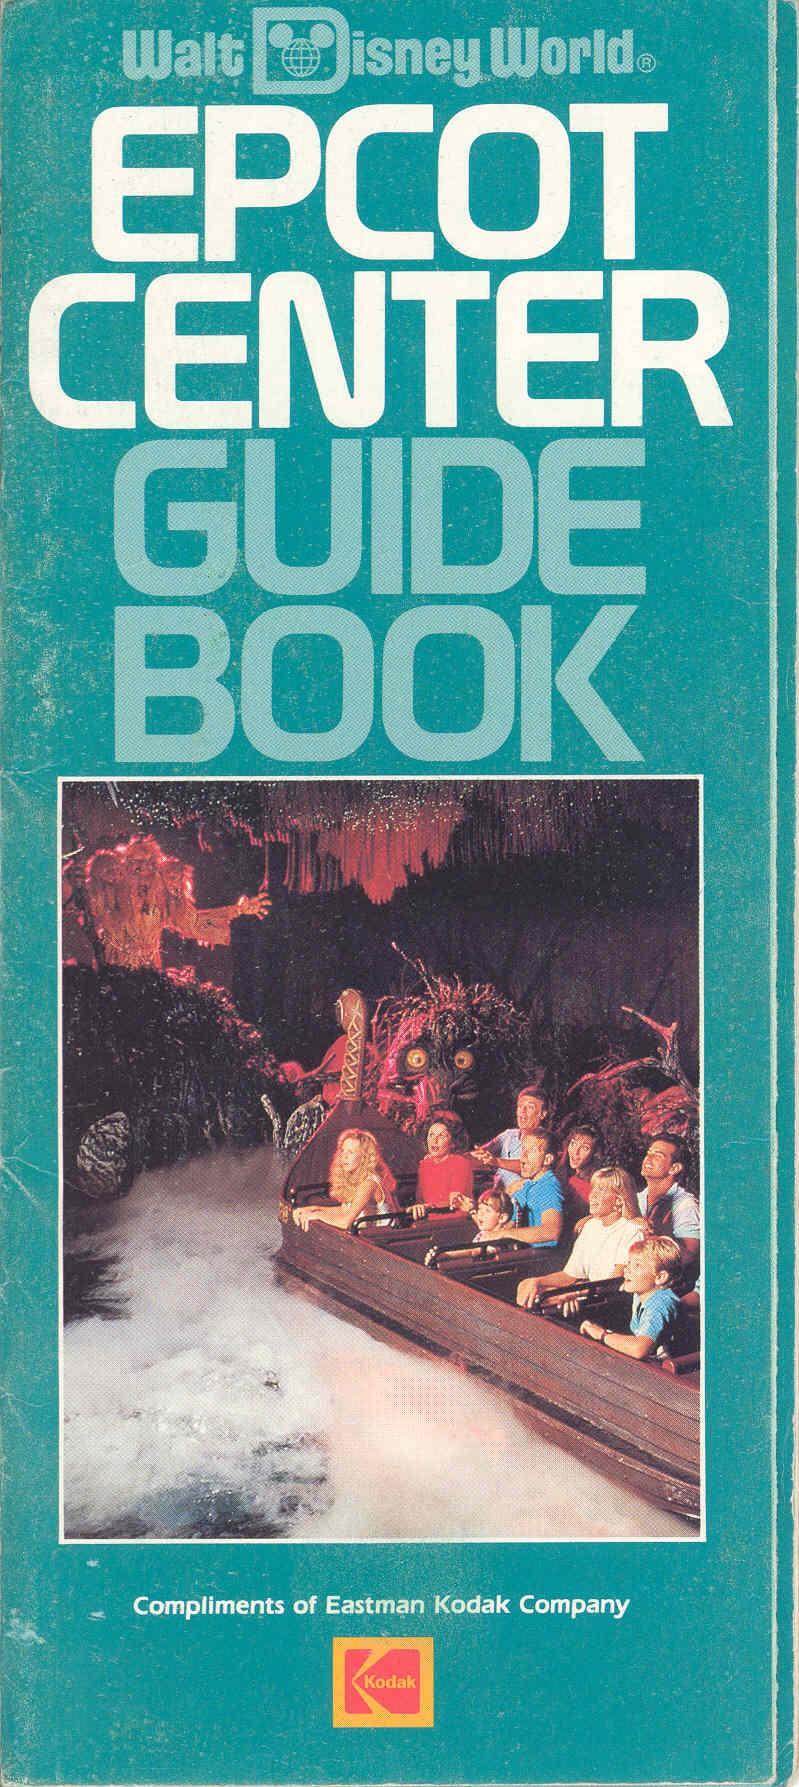 Epcot Center Entertainment Guide 1989